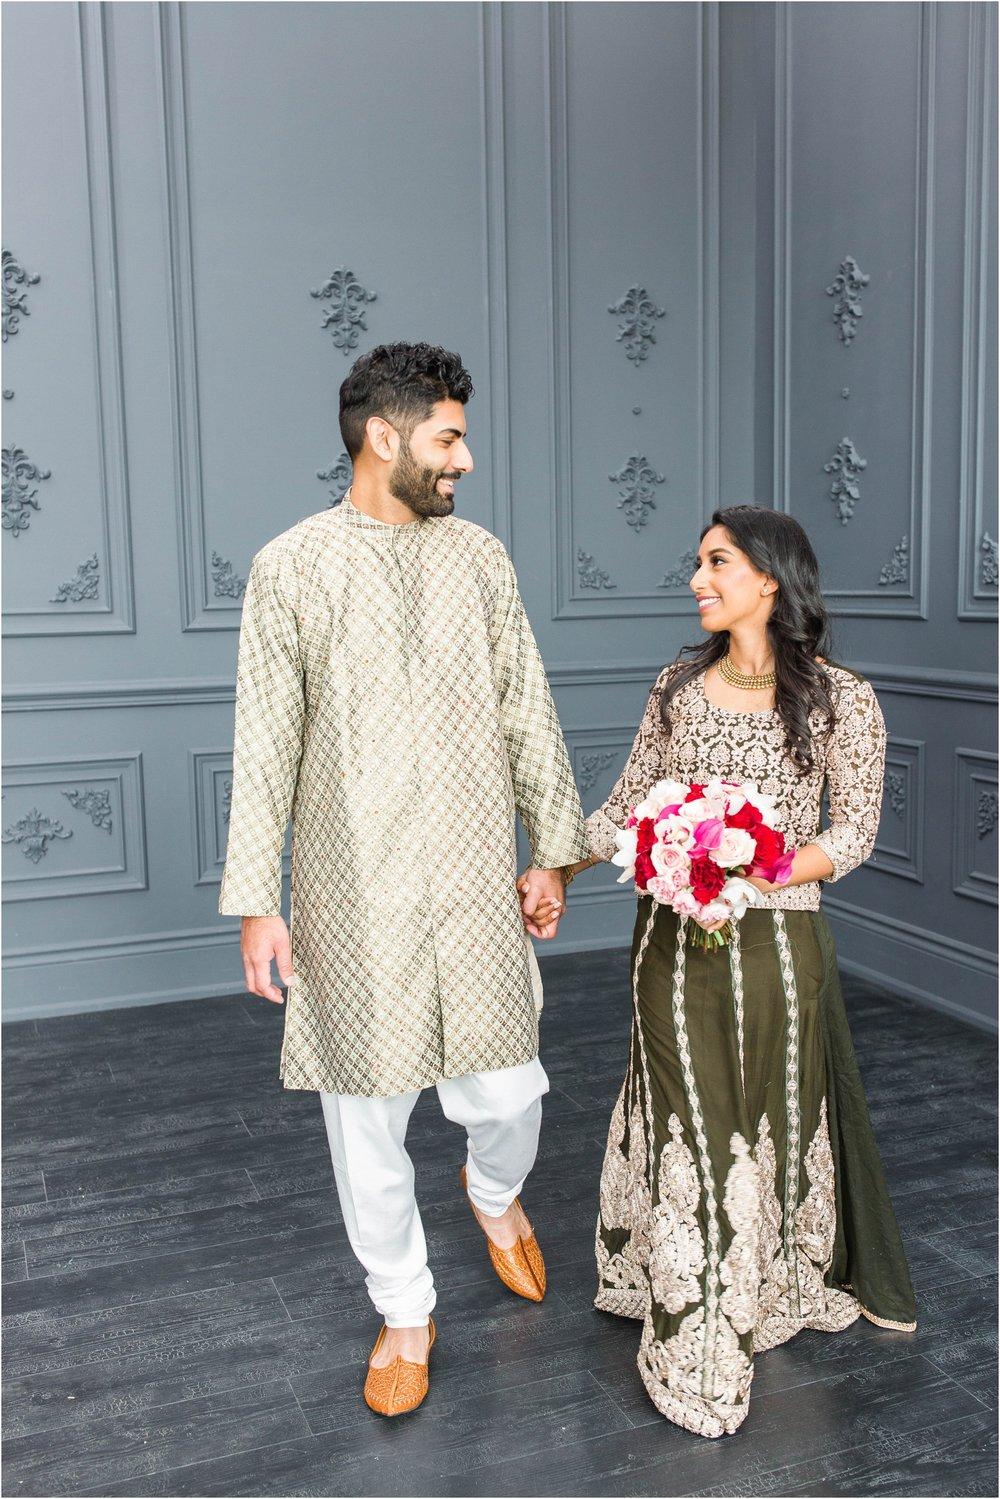 Mint-Room-Studios-Anniversary-Session-Toronto-Mississauga-Brampton-Scarborough-GTA-Pakistani-Indian-Wedding-Engagement-Photographer-Photography_0030.jpg